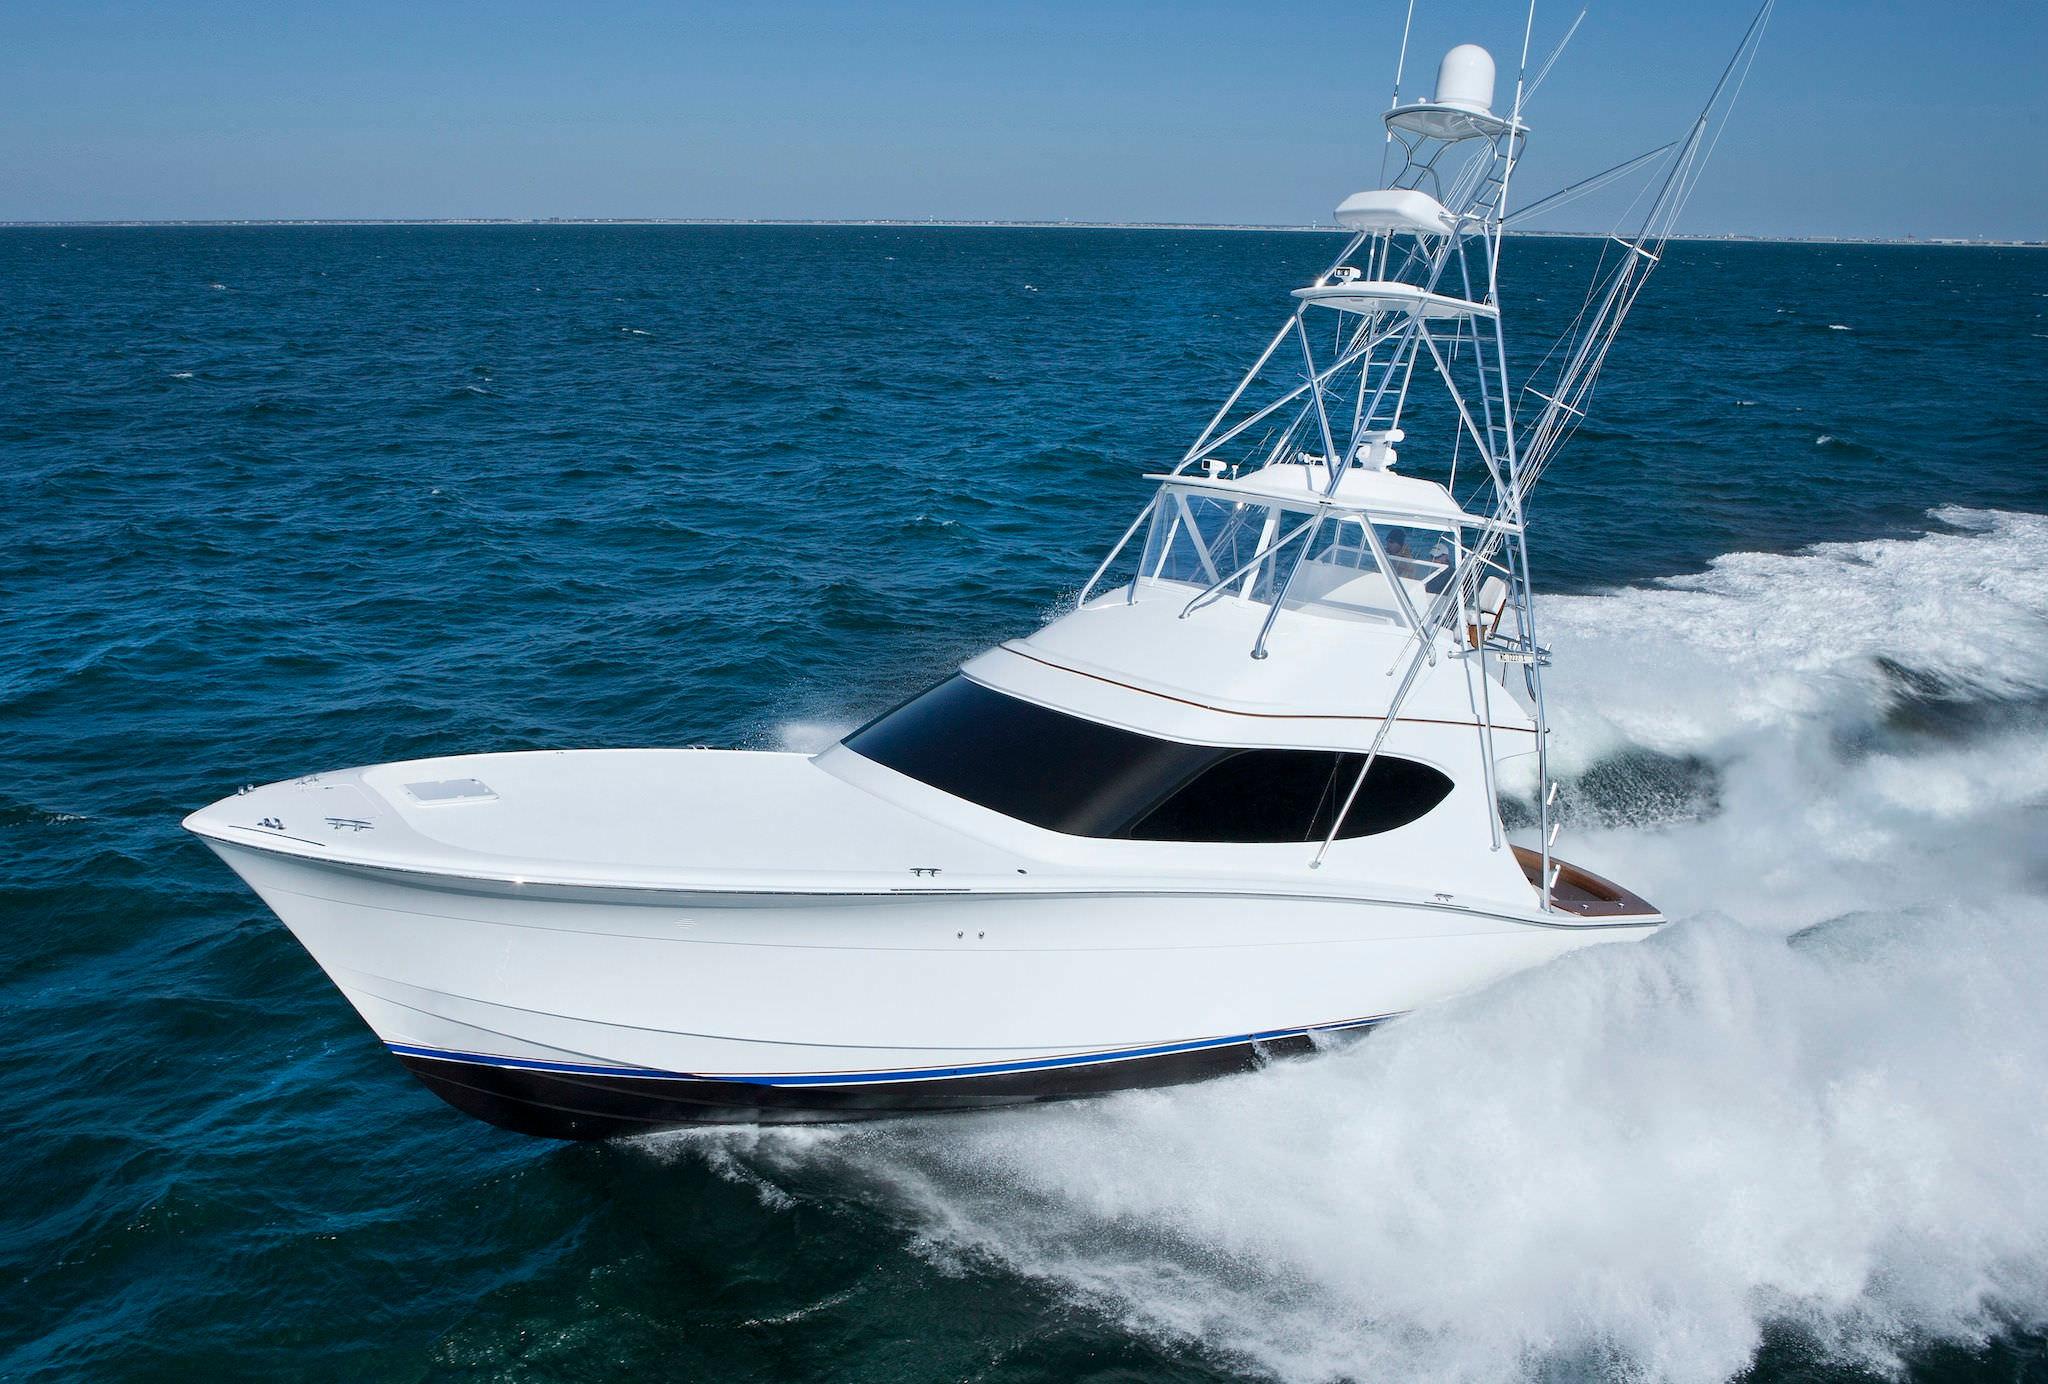 sport-fishing motor yacht / convertible / flybridge / planing hull ...